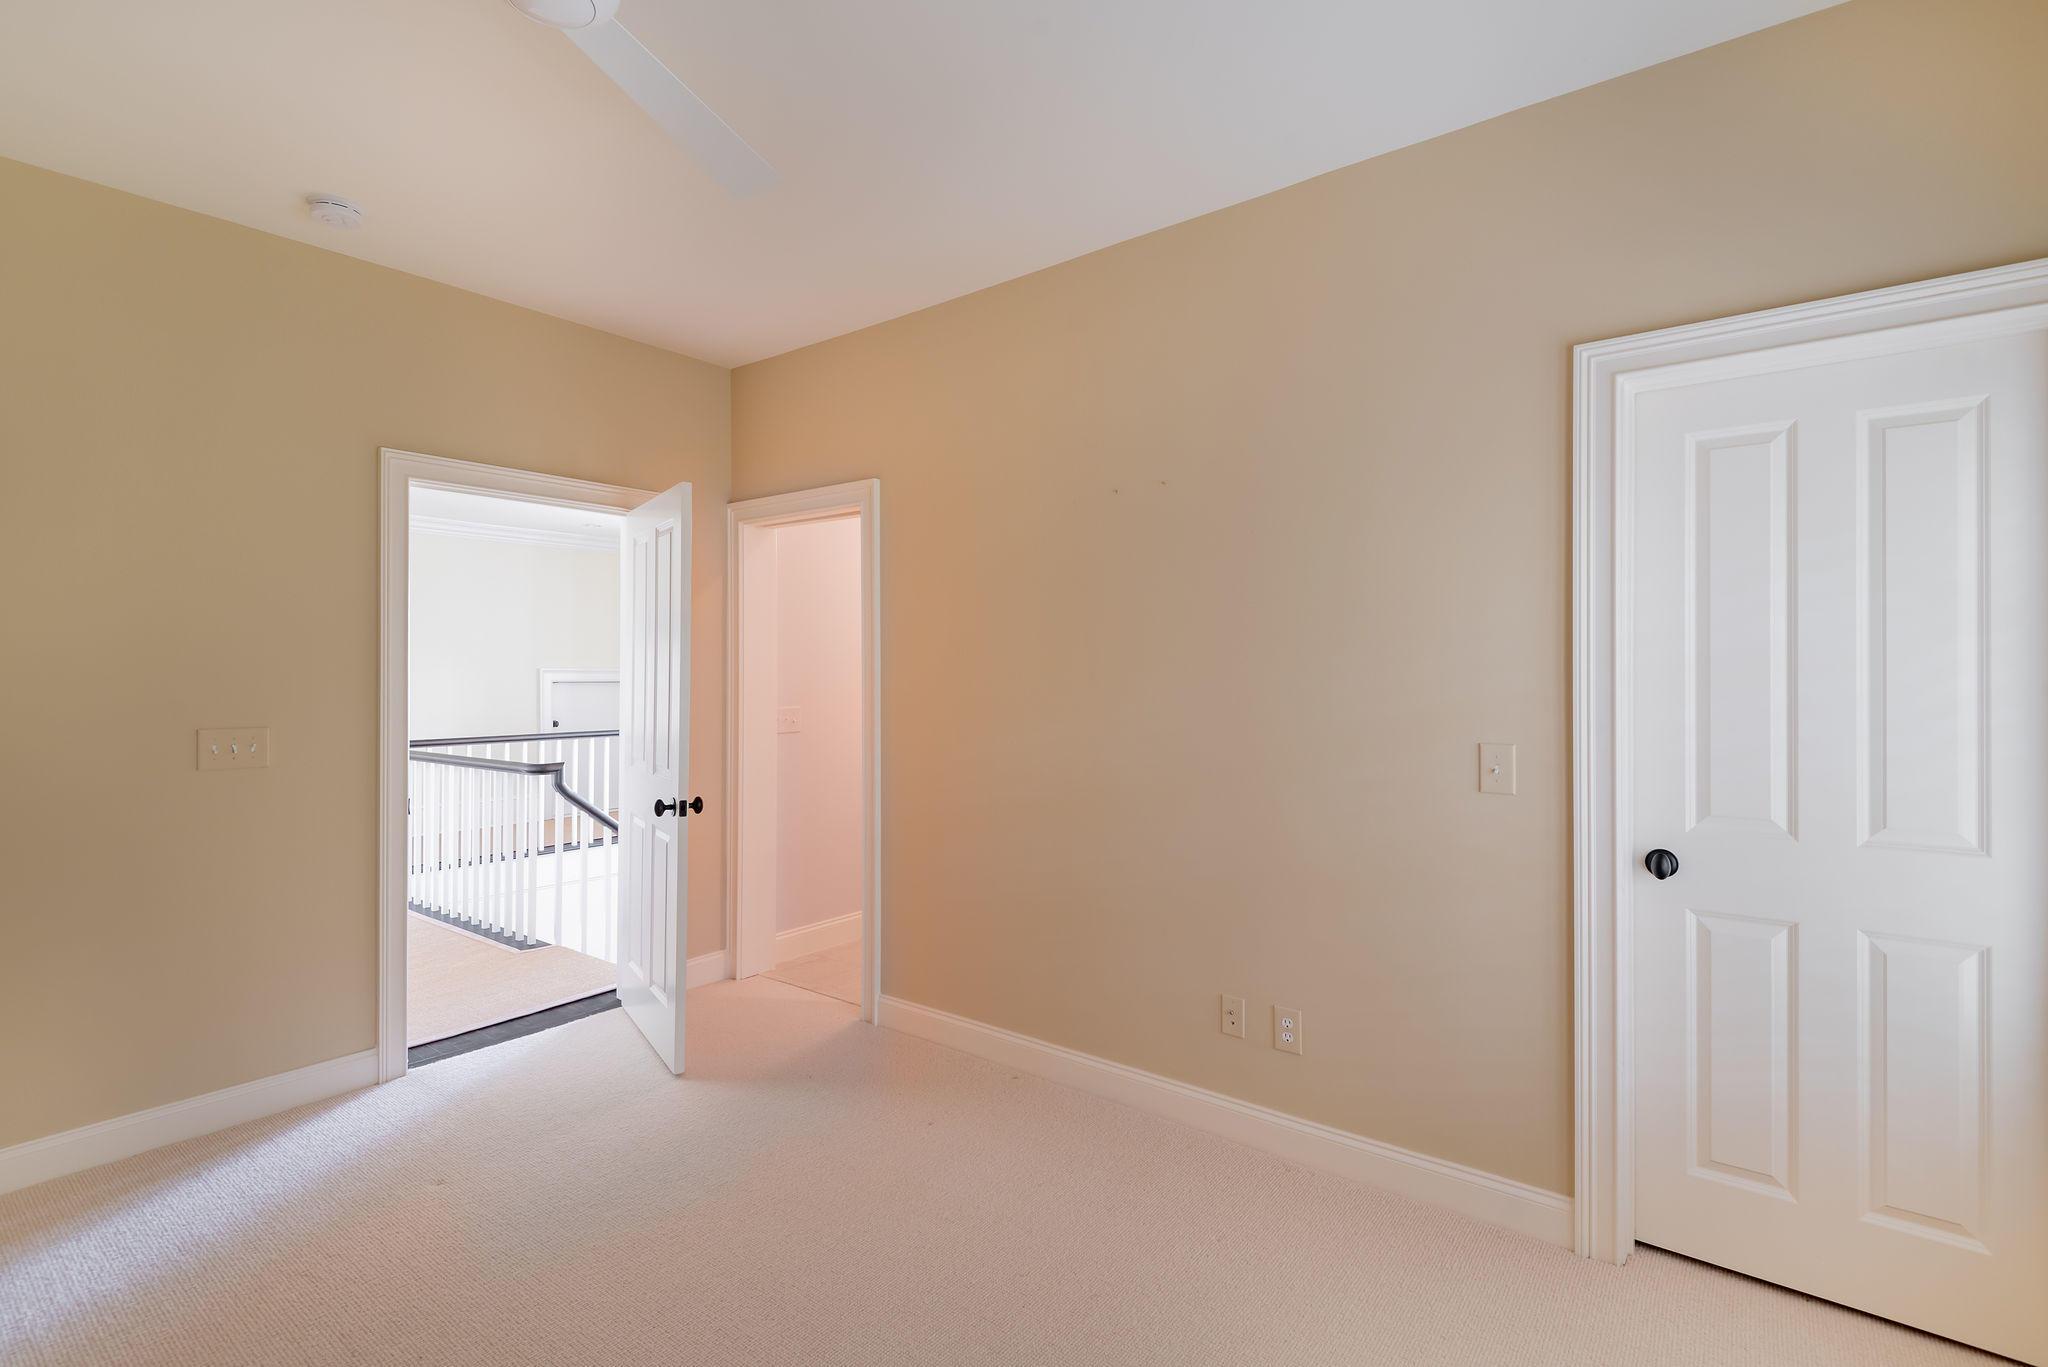 Kiawah Island Homes For Sale - 3 Grey Widgeon, Kiawah Island, SC - 29